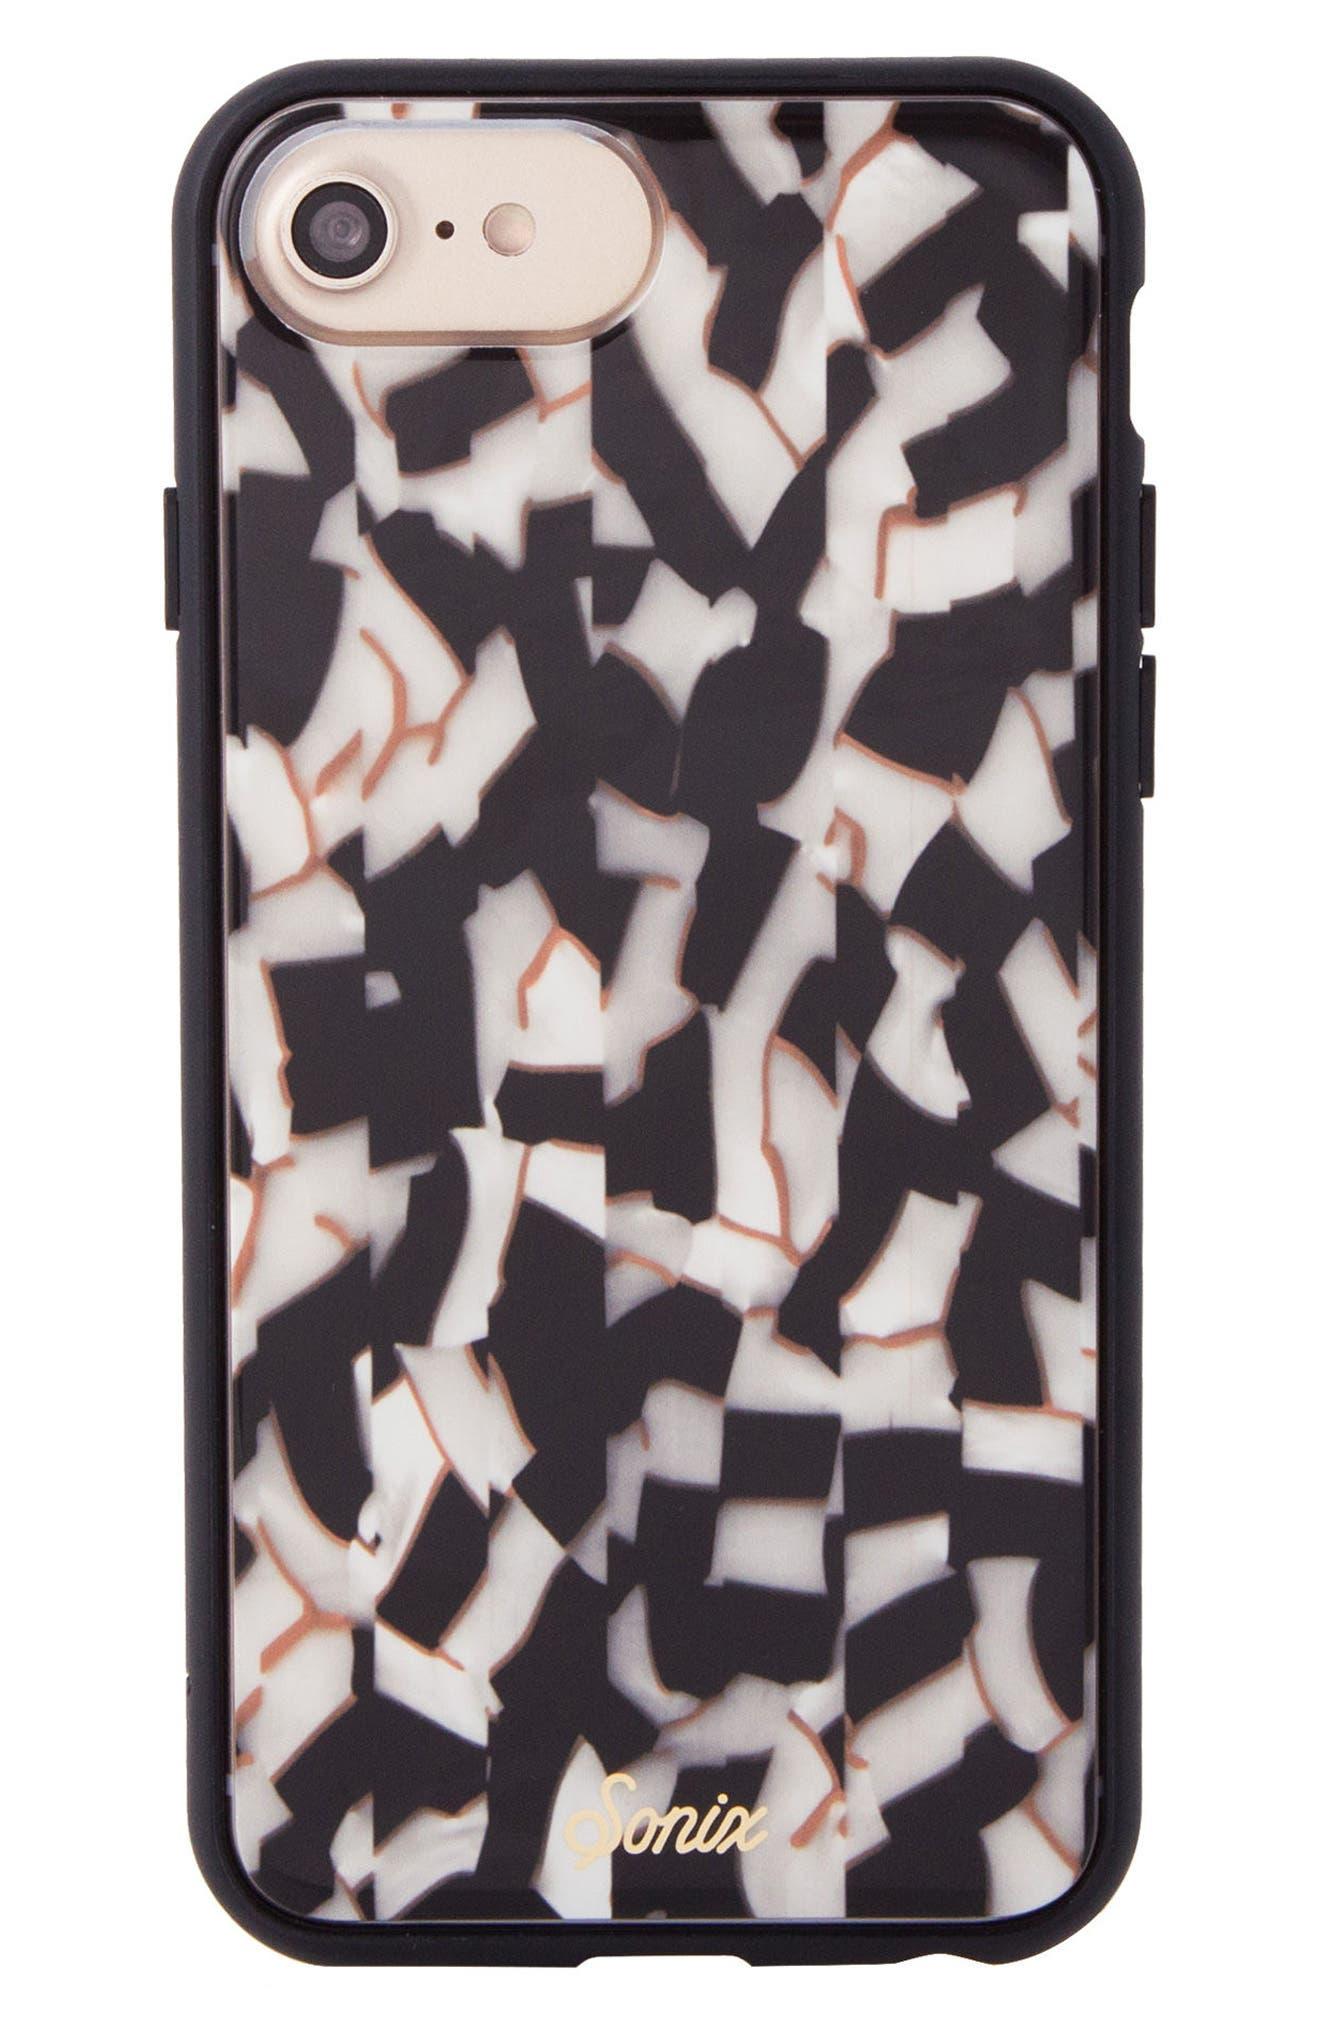 Pearlescent Black iPhone 6/6s/7/8 & 6/6s/7/8 Plus Case,                         Main,                         color, Black/ White